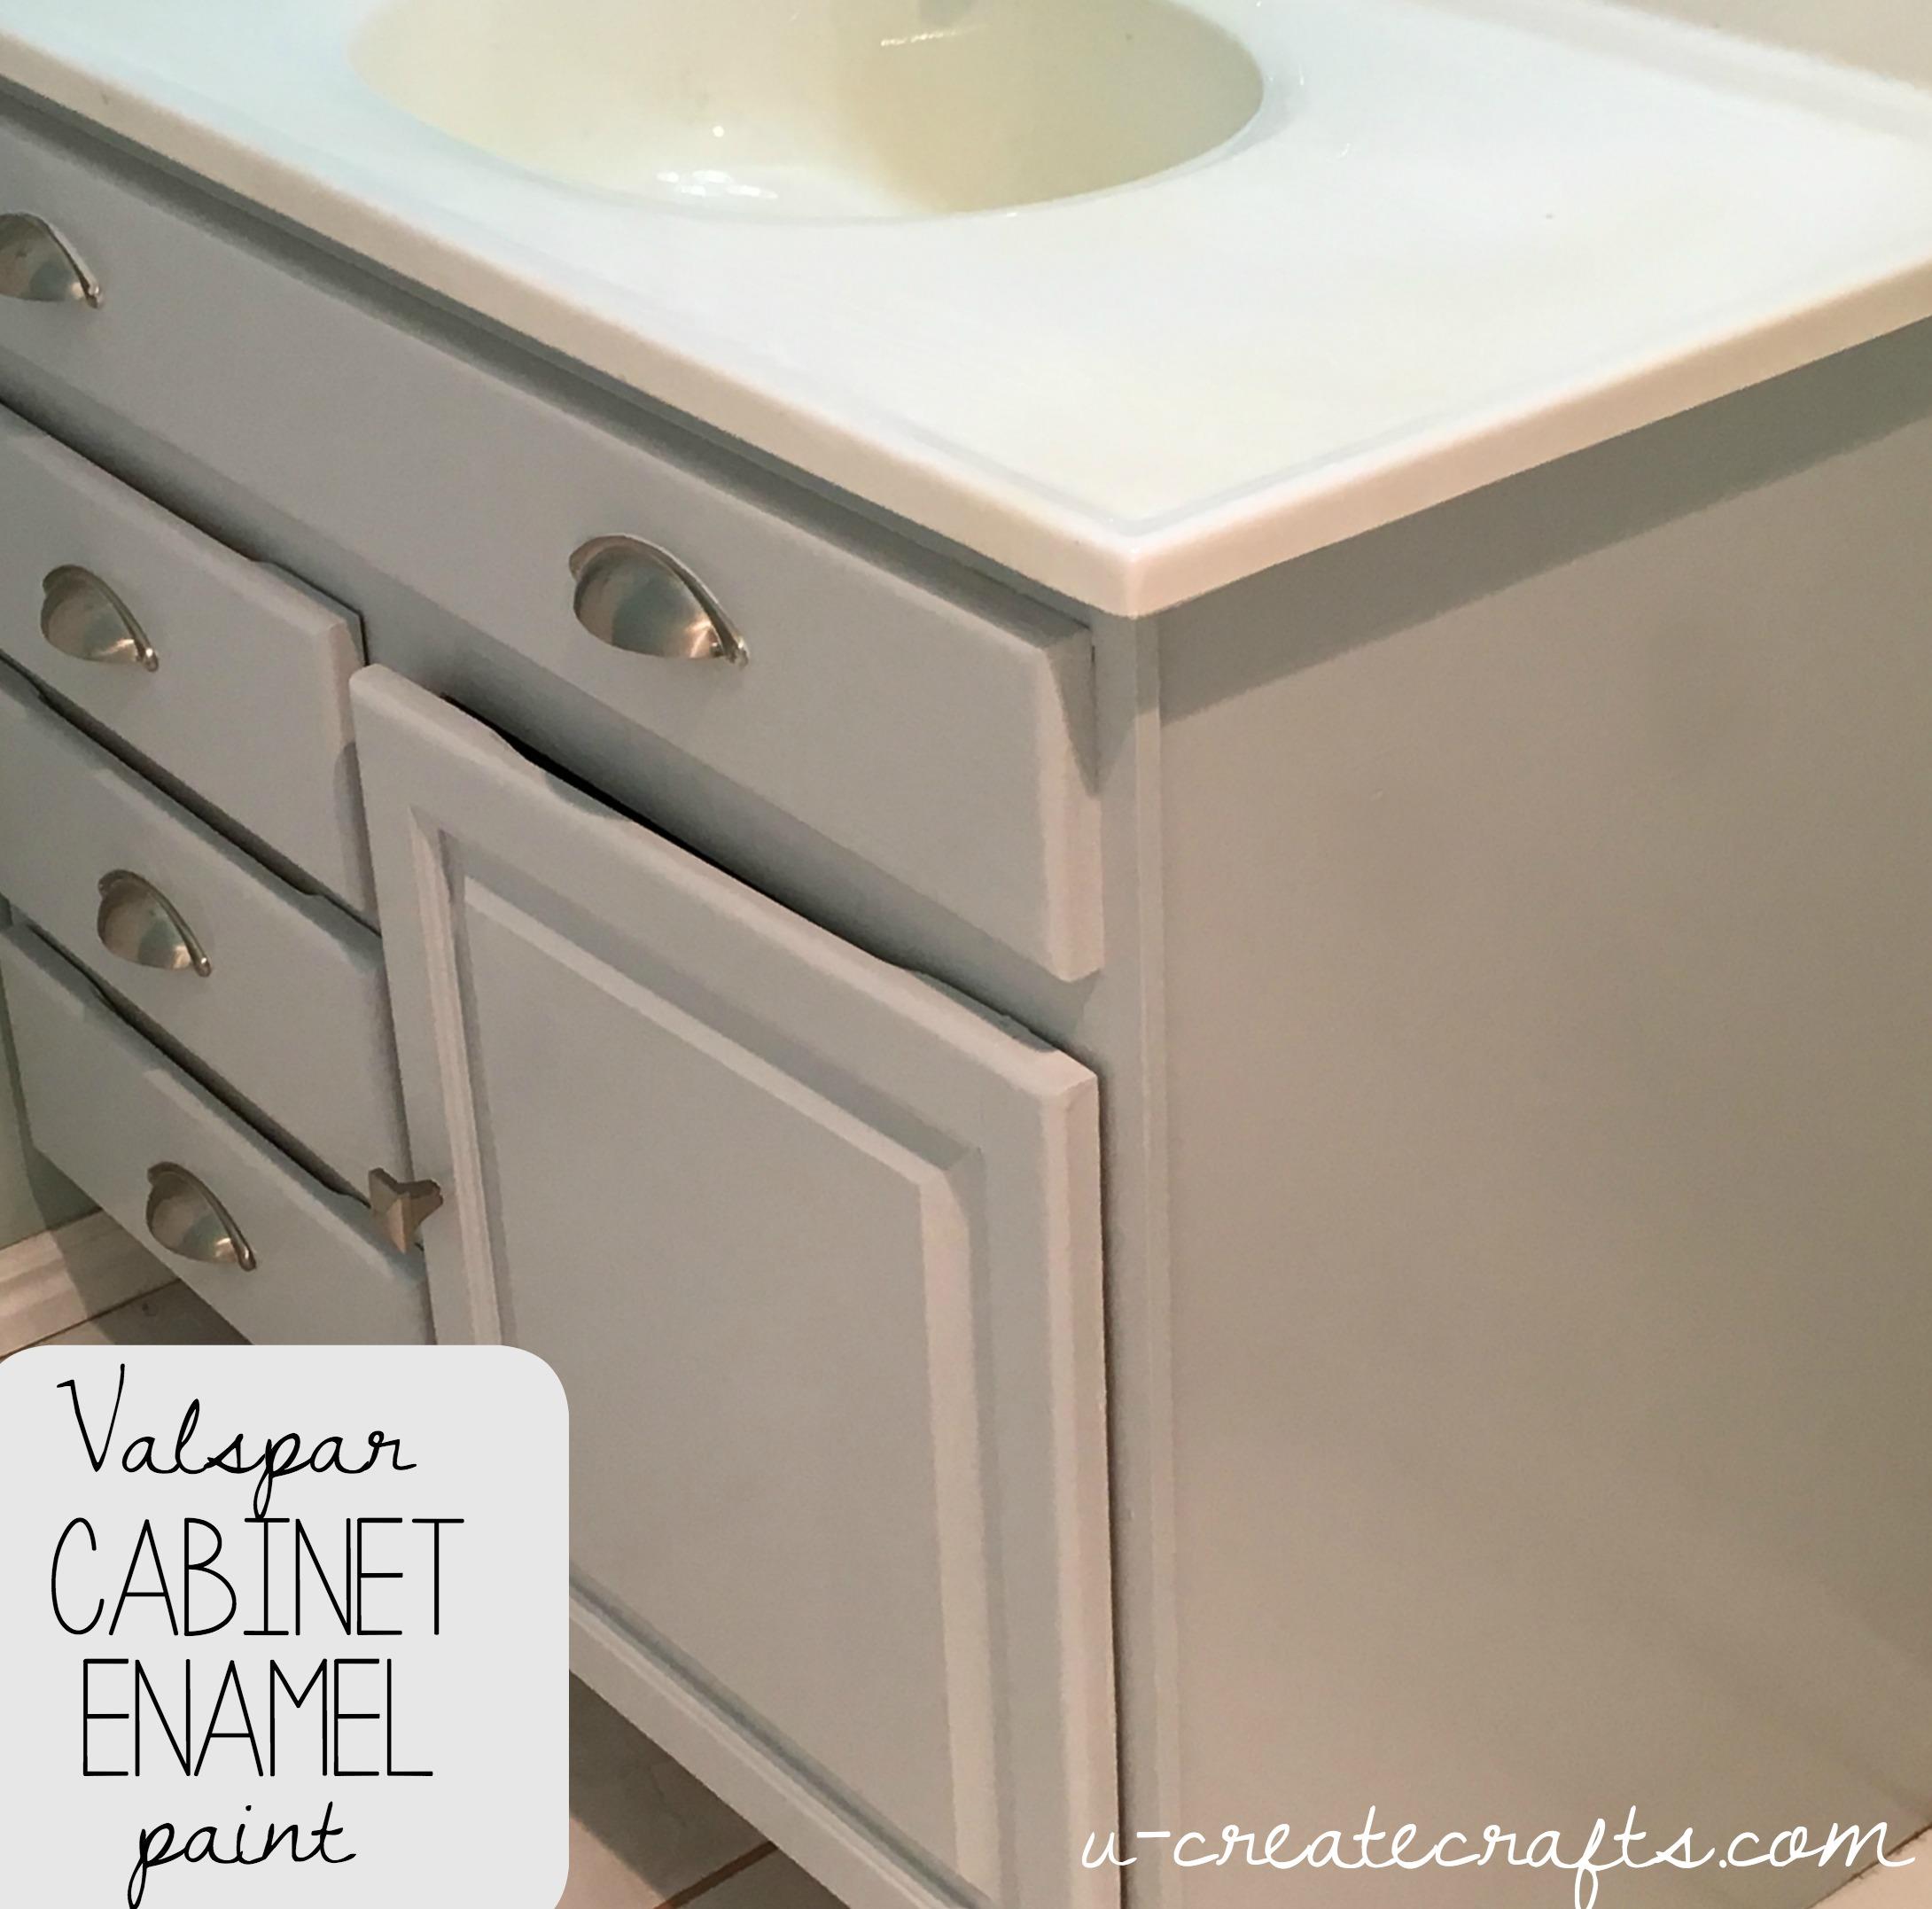 Best Kitchen Gallery: Valspar Cabi Enamel Paint U Create of Valspar Kitchen Cabinet Paint on cal-ite.com